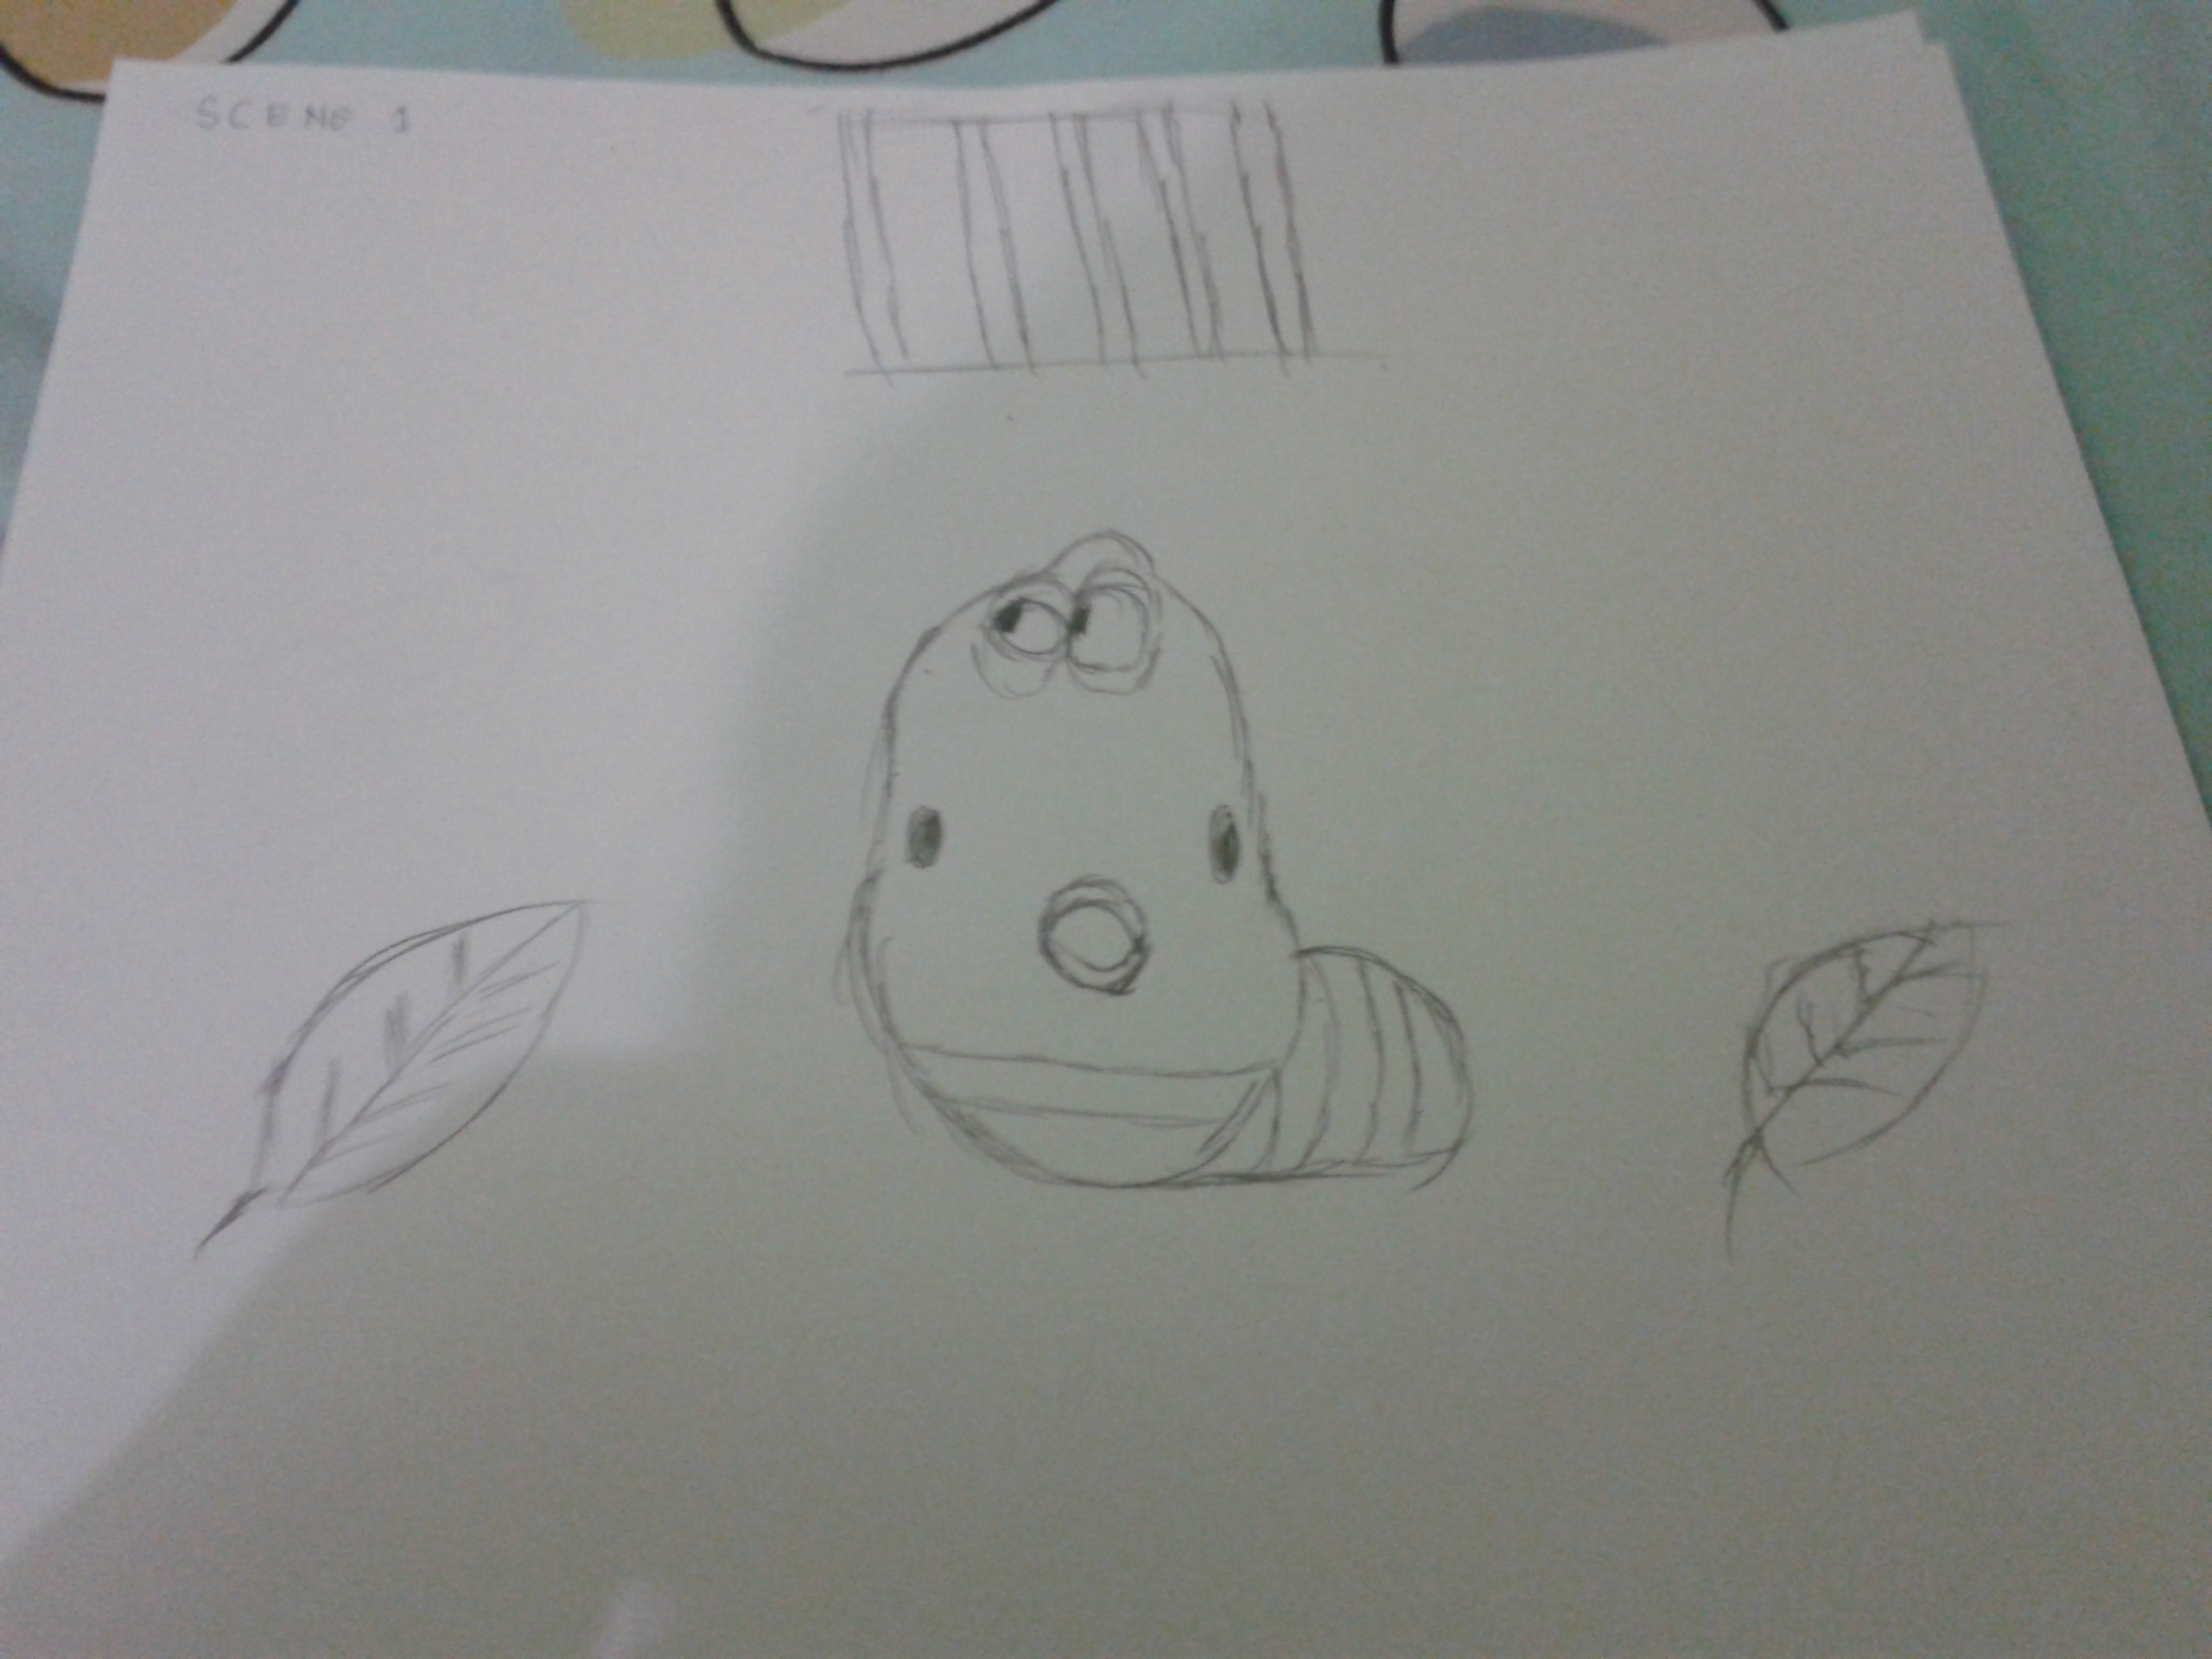 Kumpulan Gambar Sketsa Kartun Larva